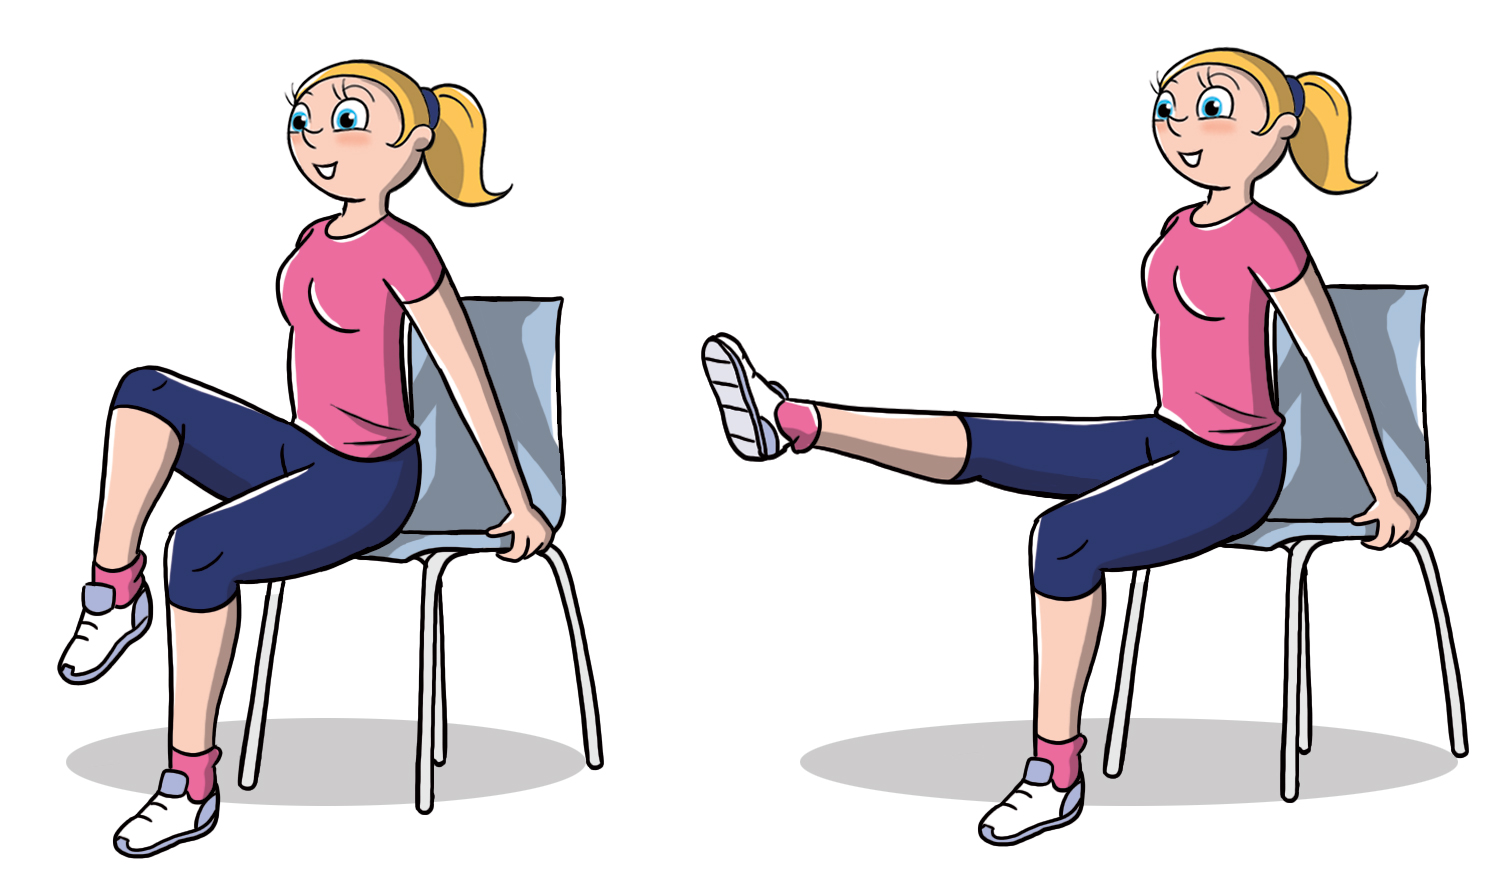 esercizio anticellulite efficace: addominali